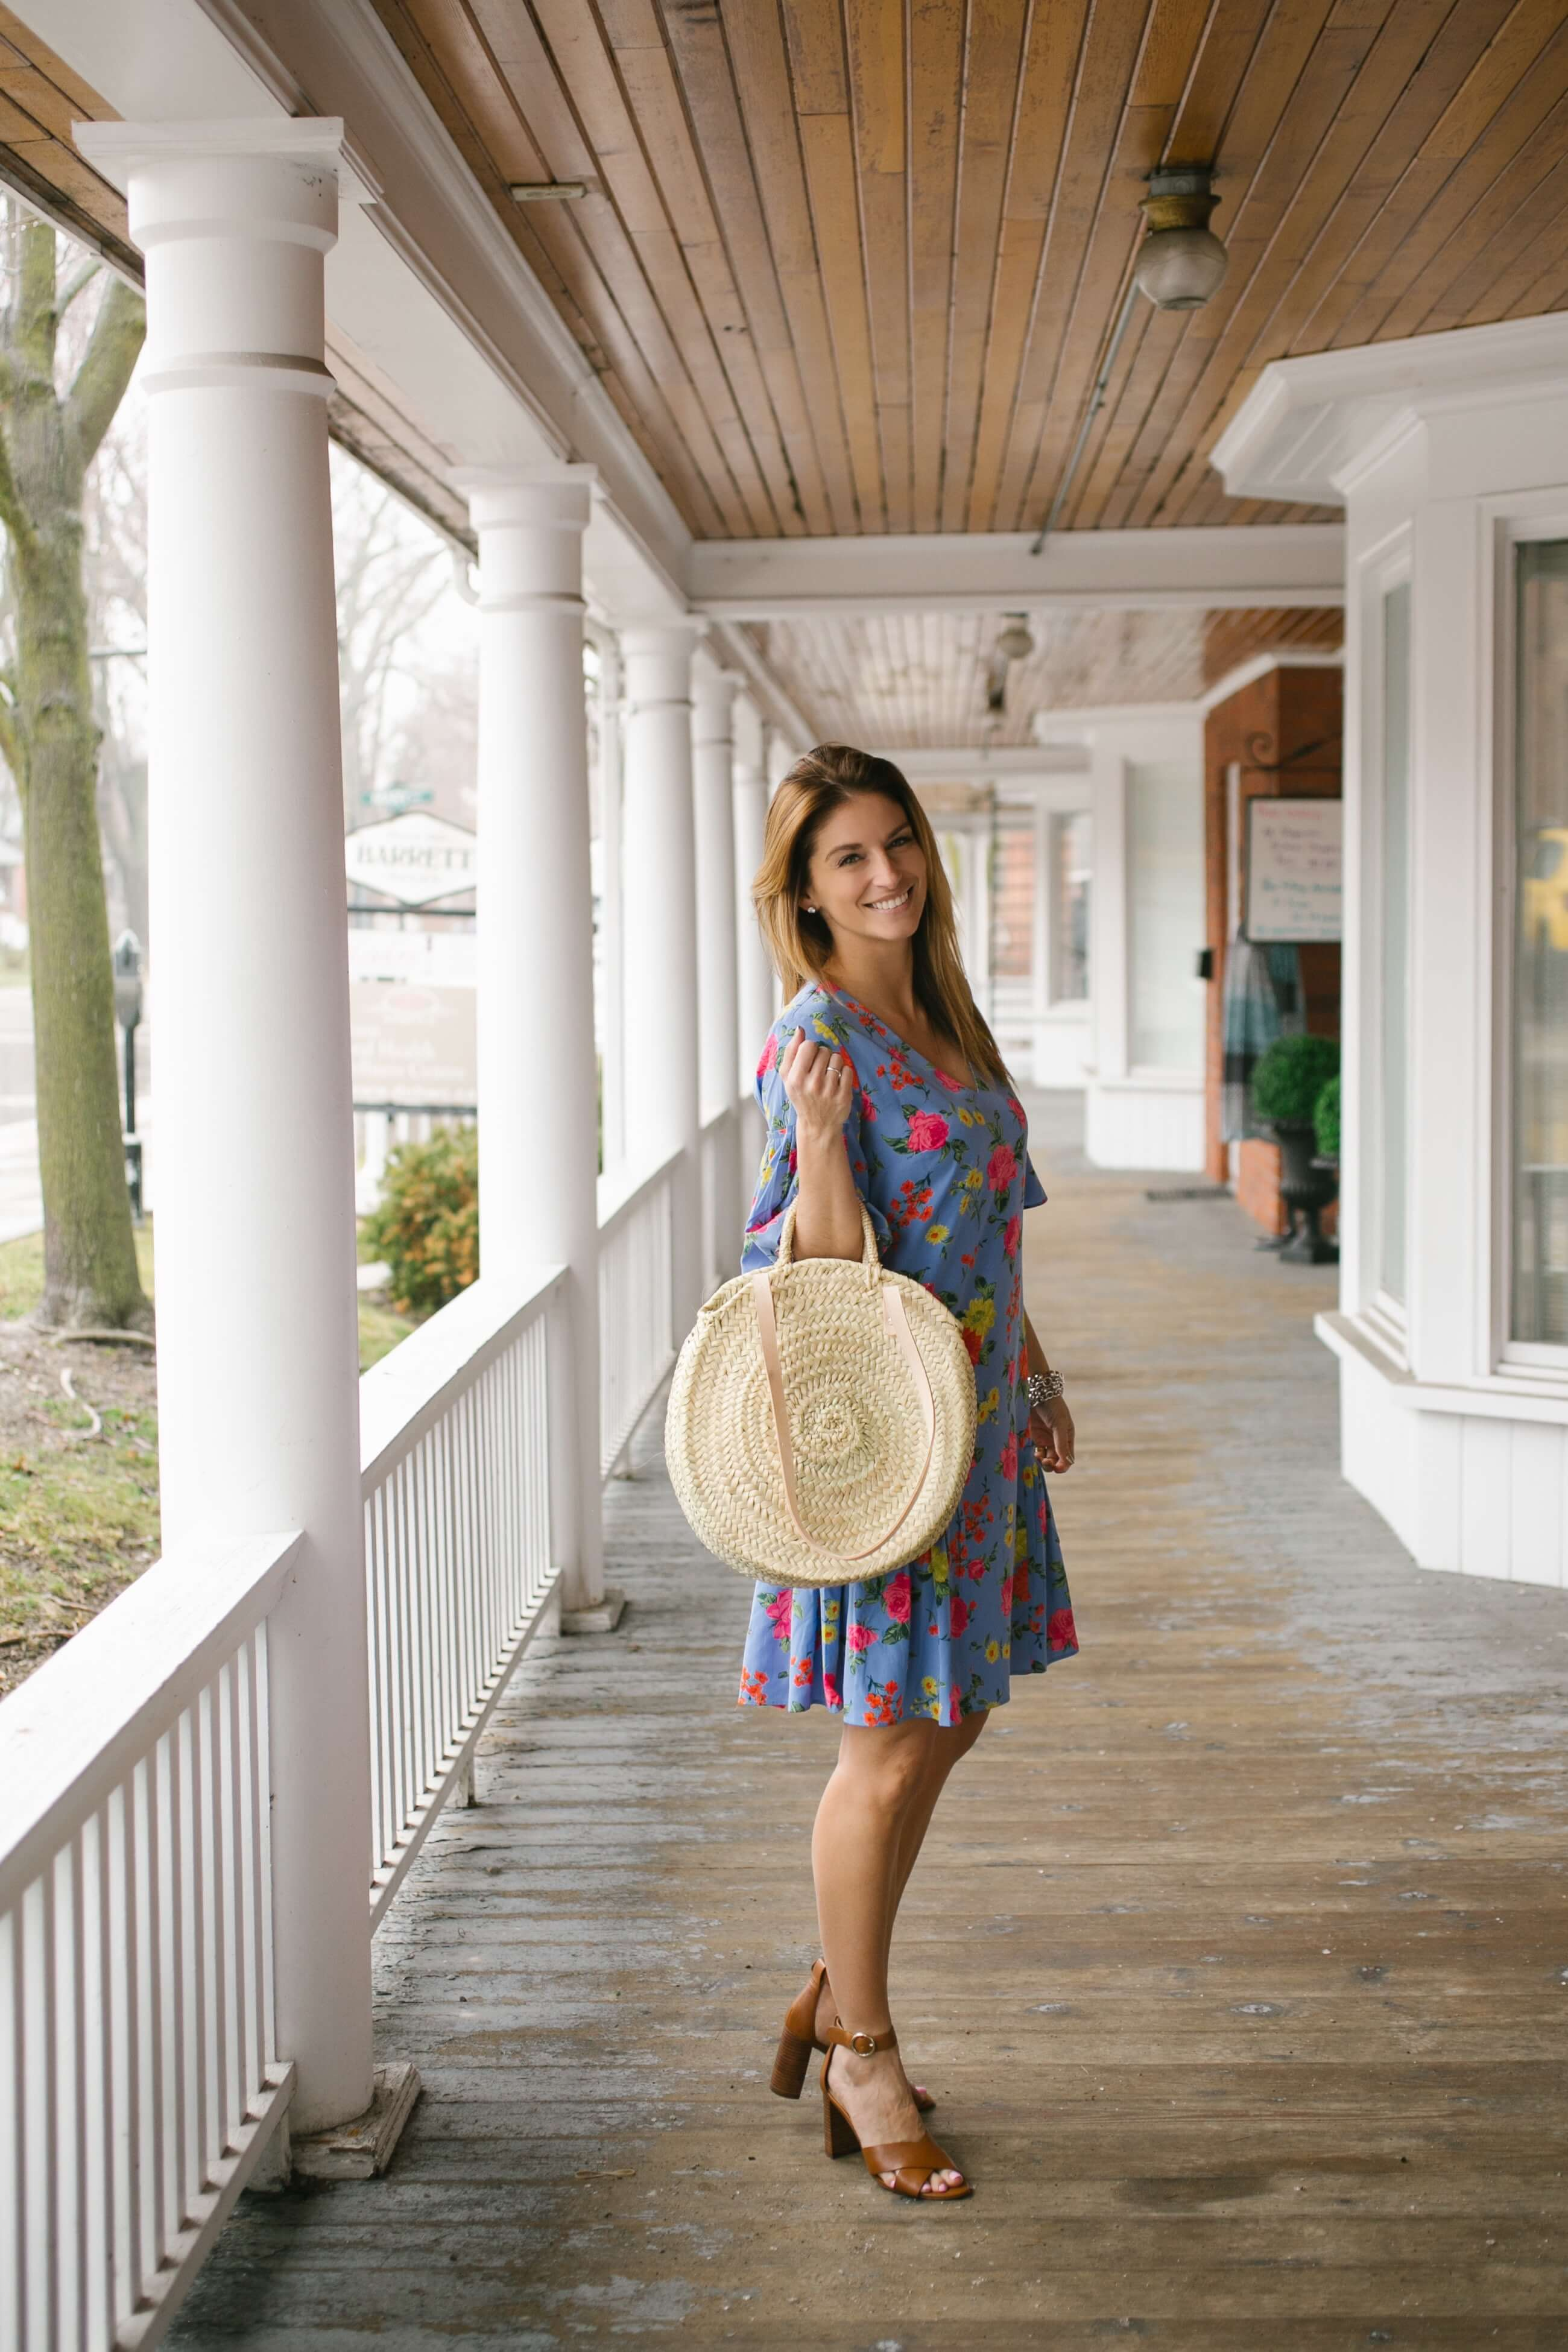 Ann Taylor Floral Flounce Shift Dress, Ann Taylor Liya Leather Block Heel Sandals, round straw bag; Ann Taylor Summer Style; Mandy Furnis sparkleshinylove